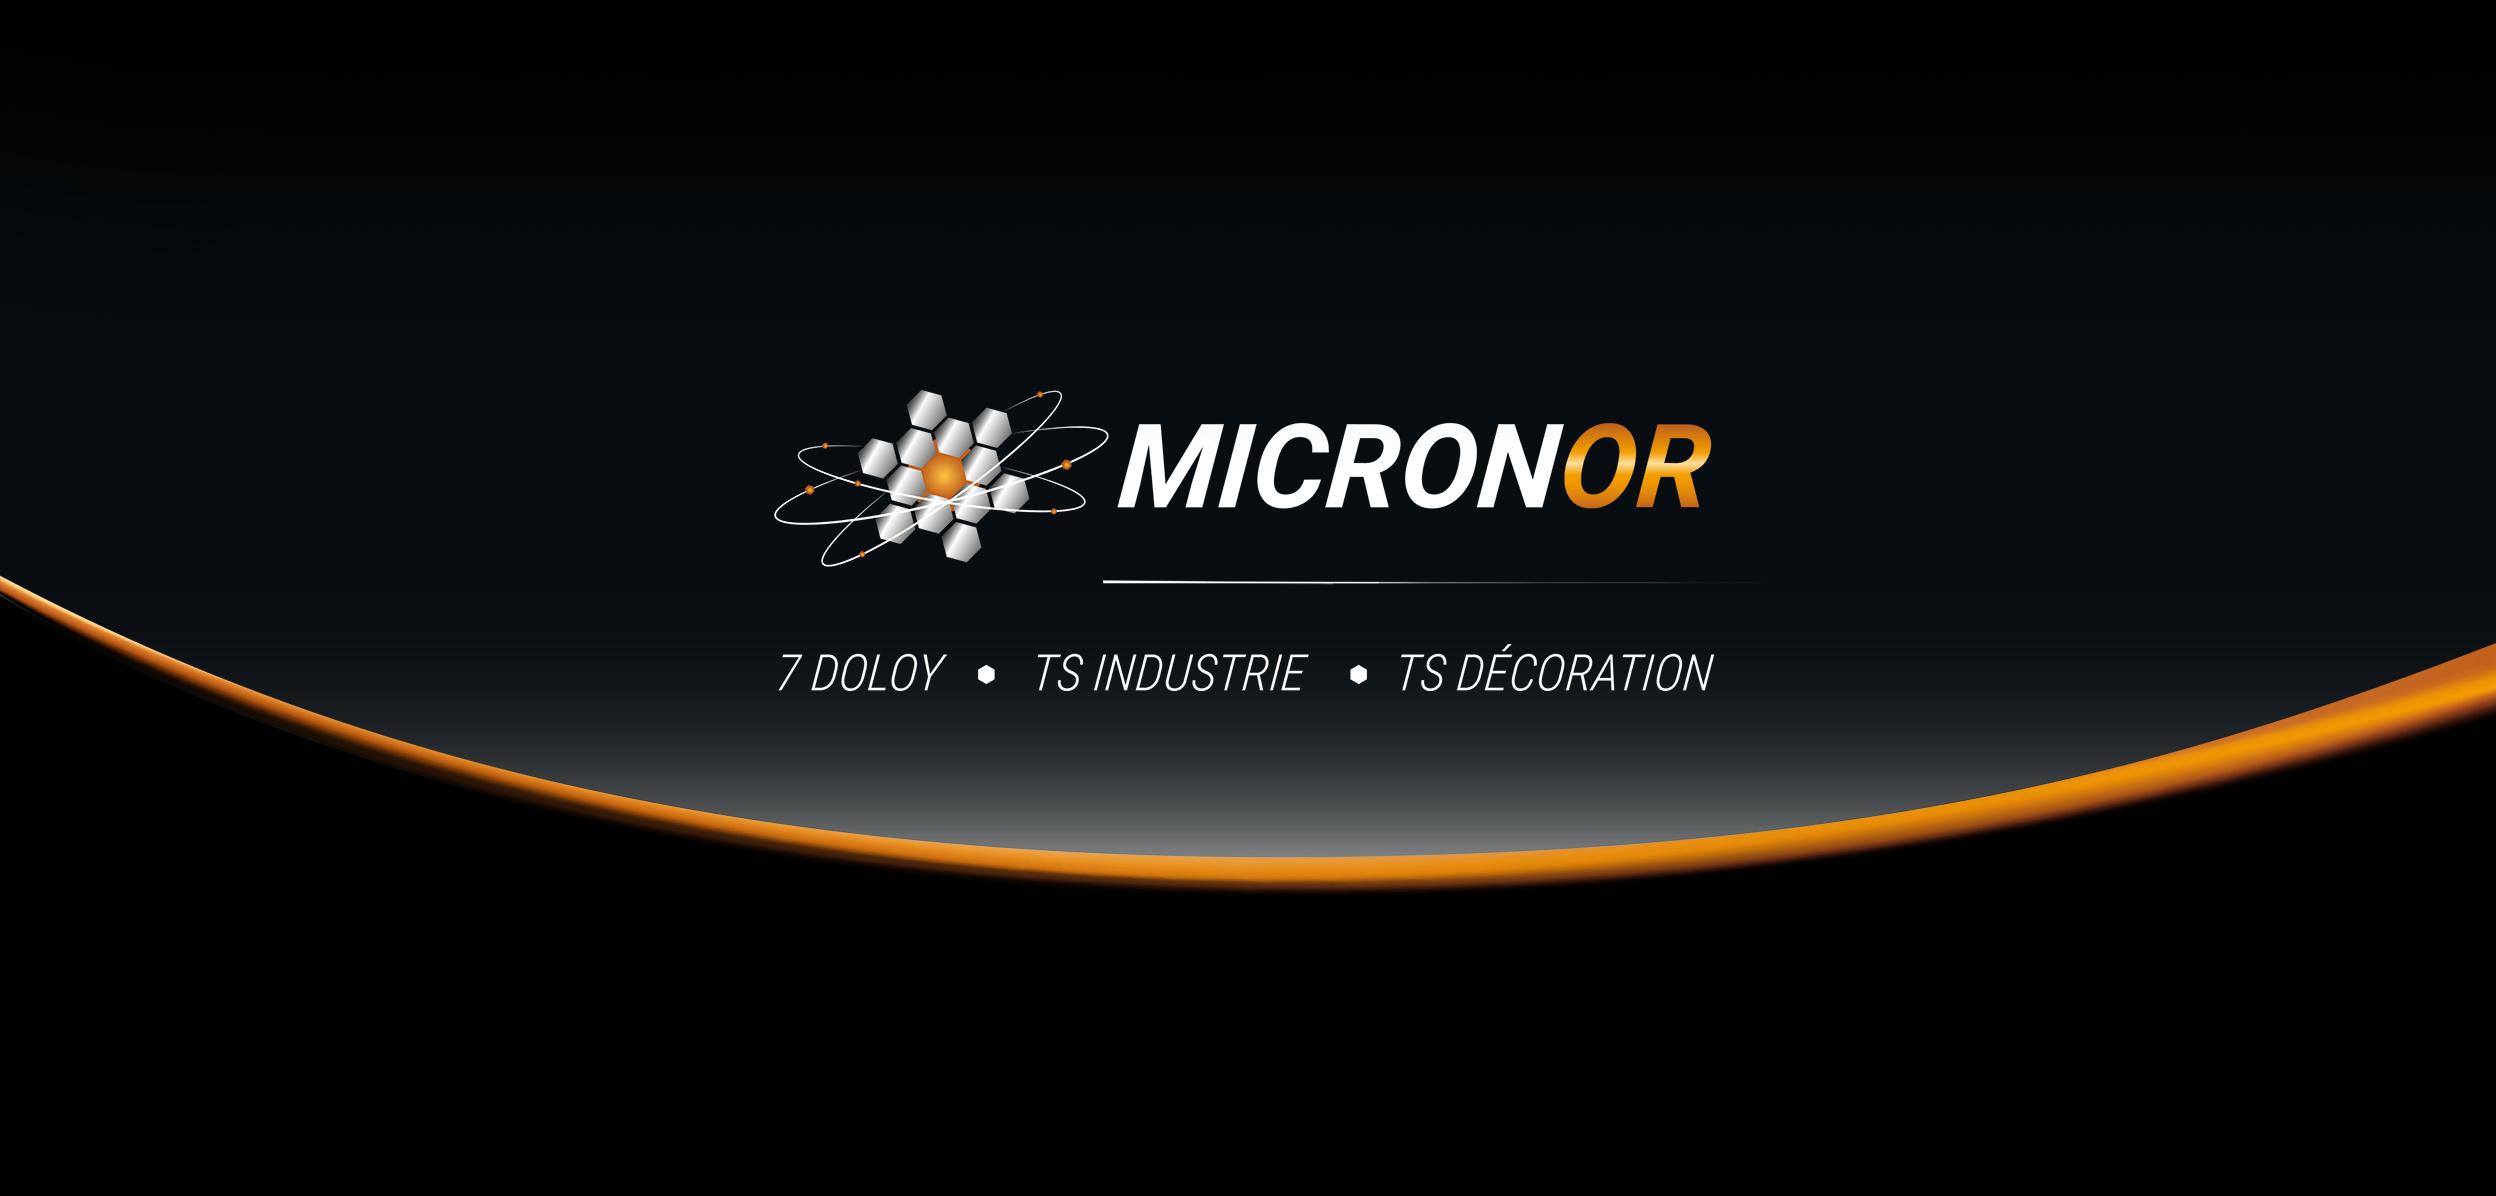 Micronor logo